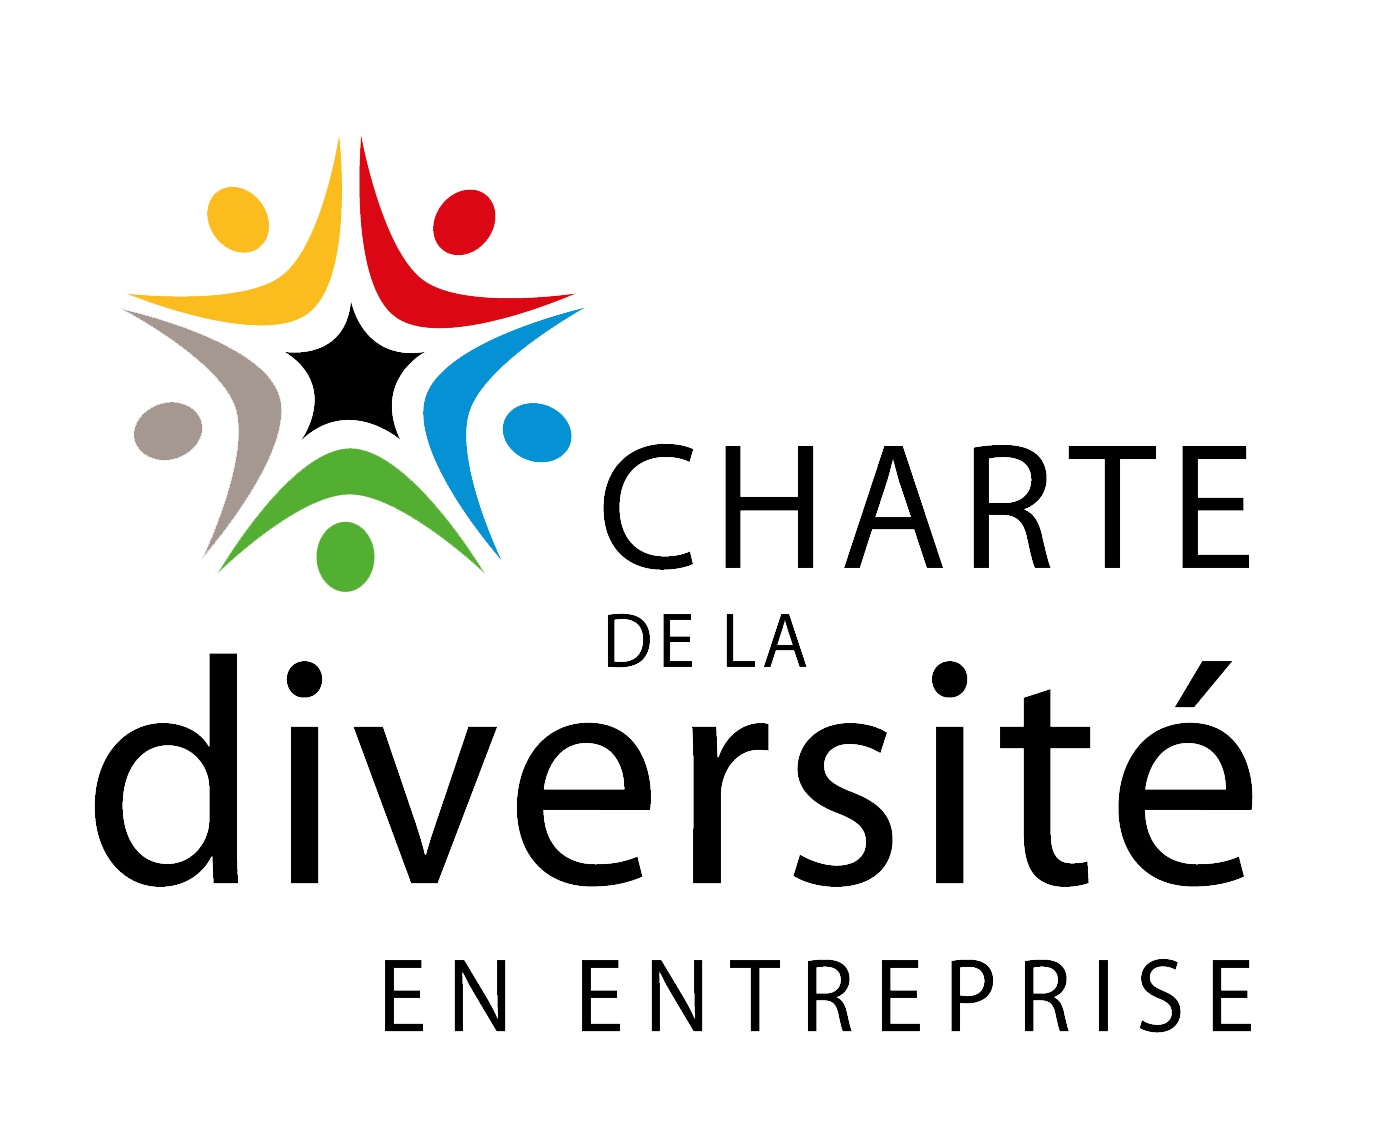 charte diversite logo